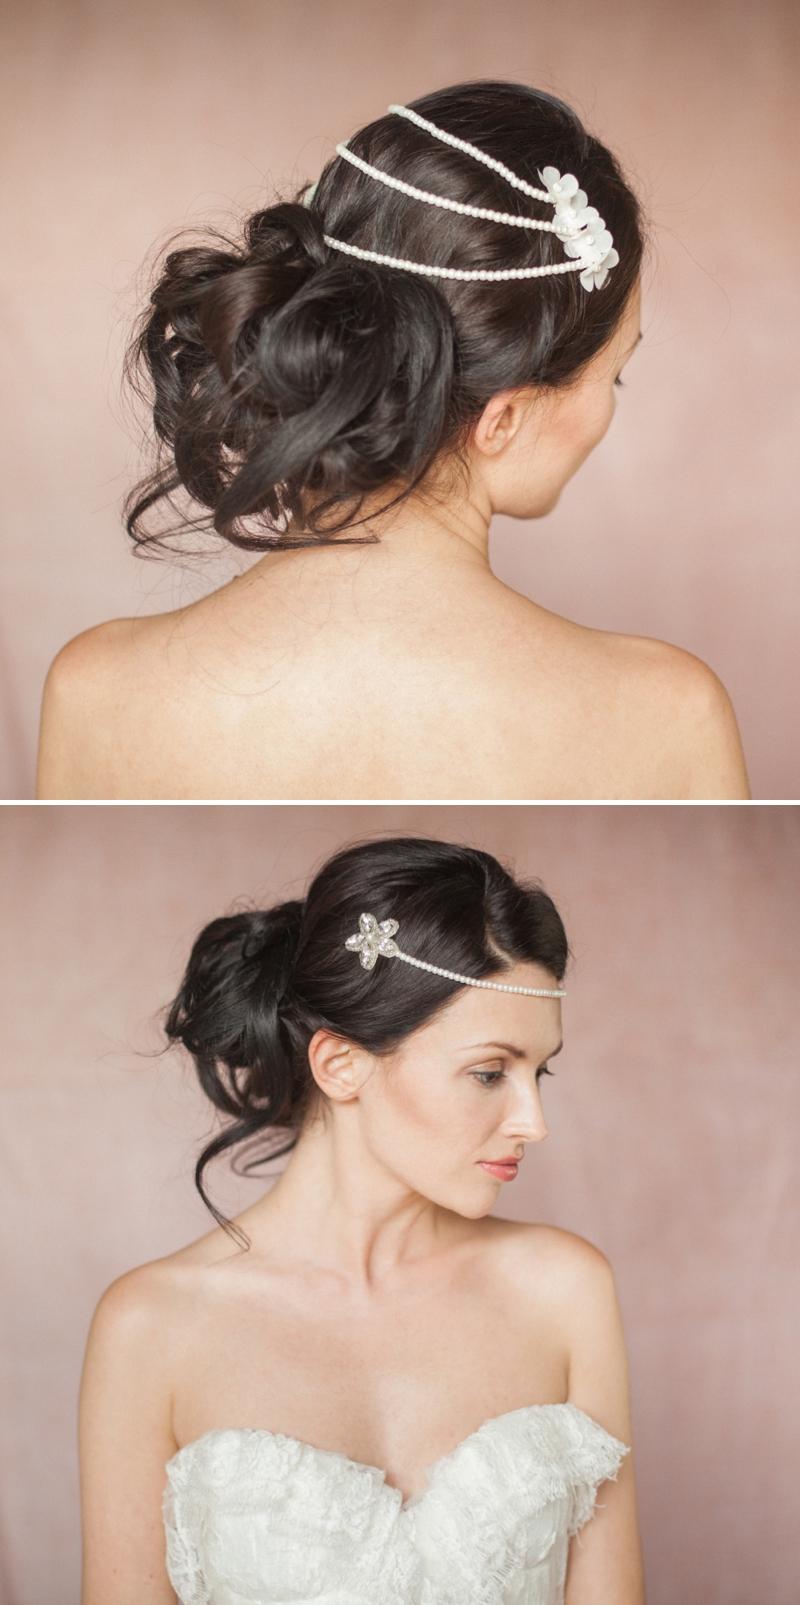 Britten 2014 Liberte Collection vintage inspired bridal wedding accessories headpieces_0155